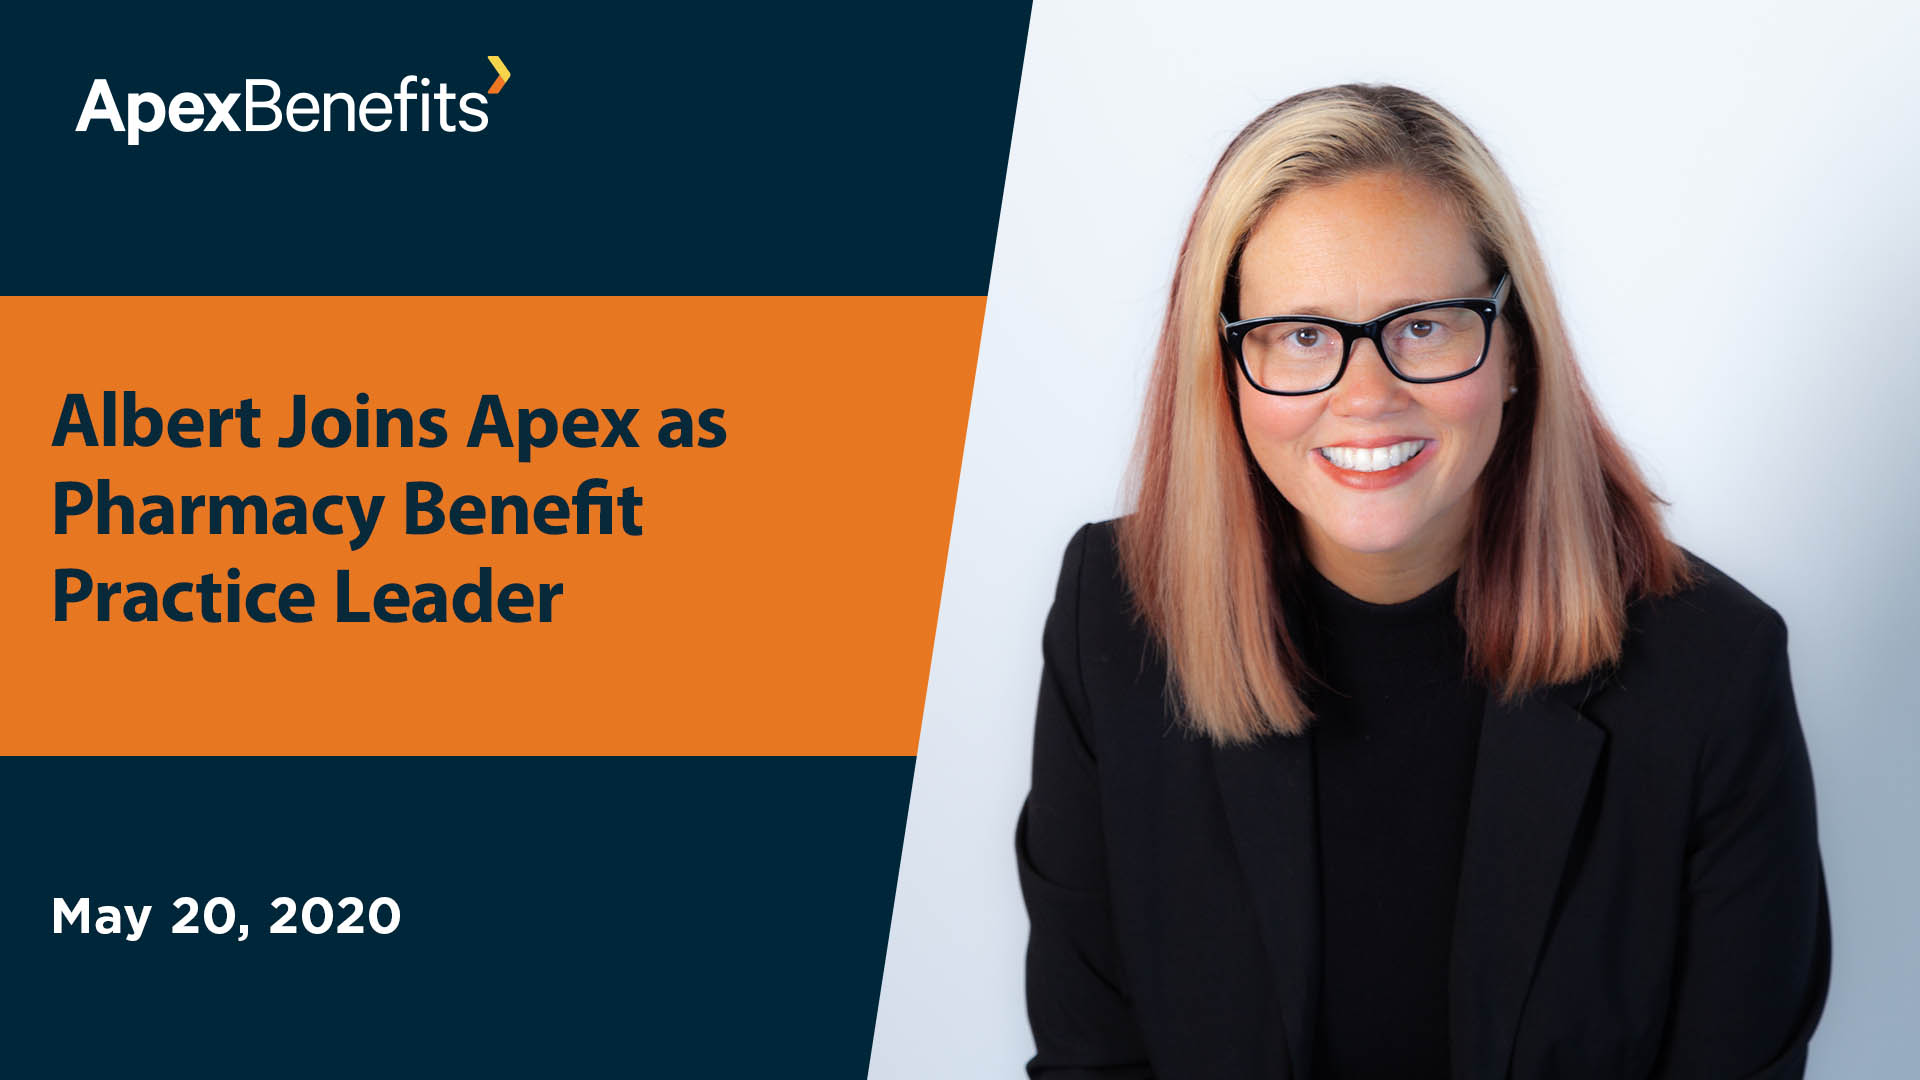 IN THE NEWS: Albert Joins Apex as Pharmacy Benefit Practice Leader